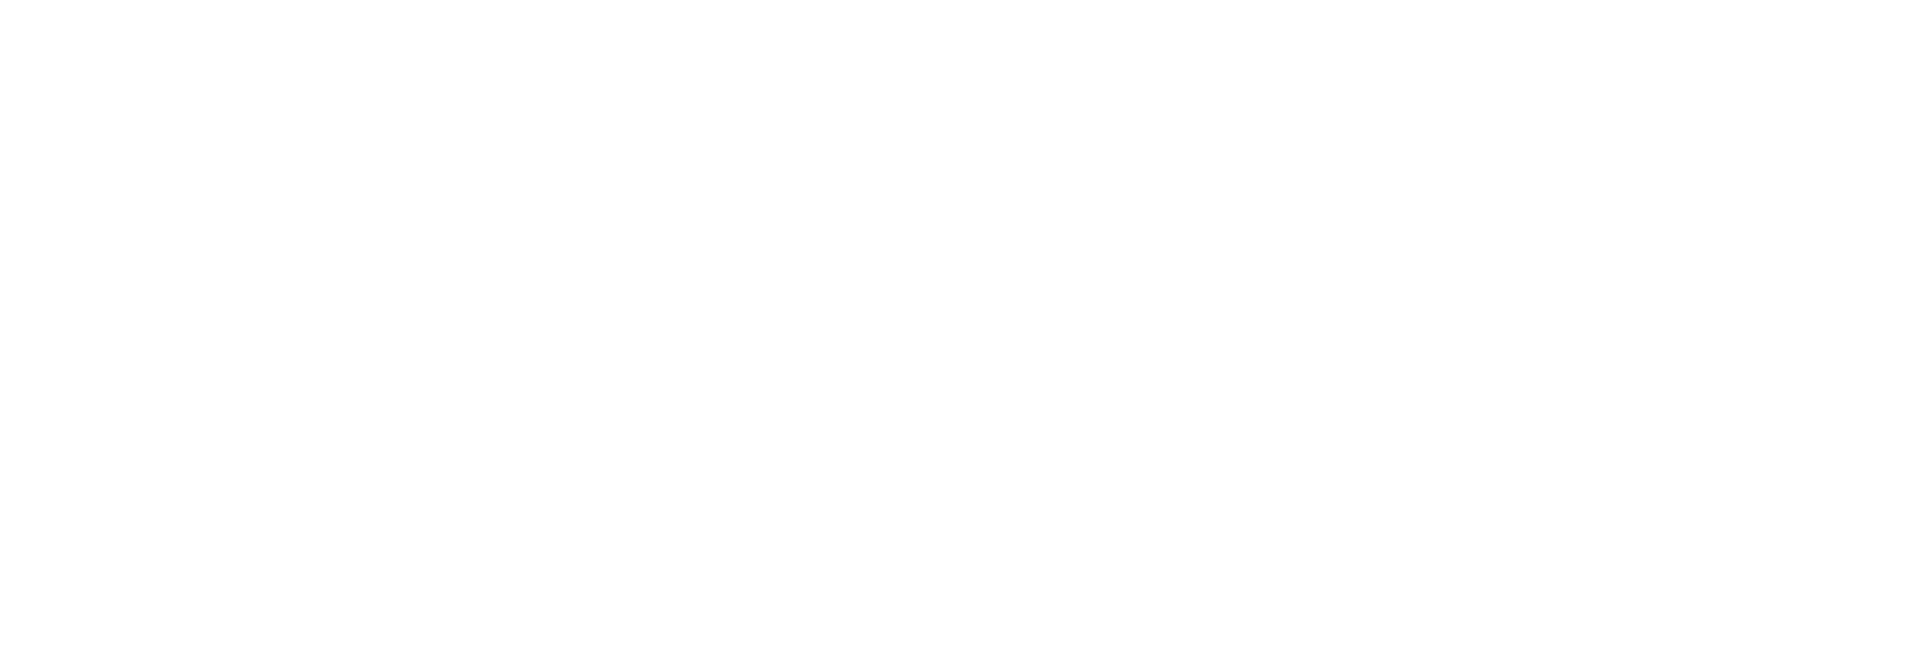 Bragi logo_white.png